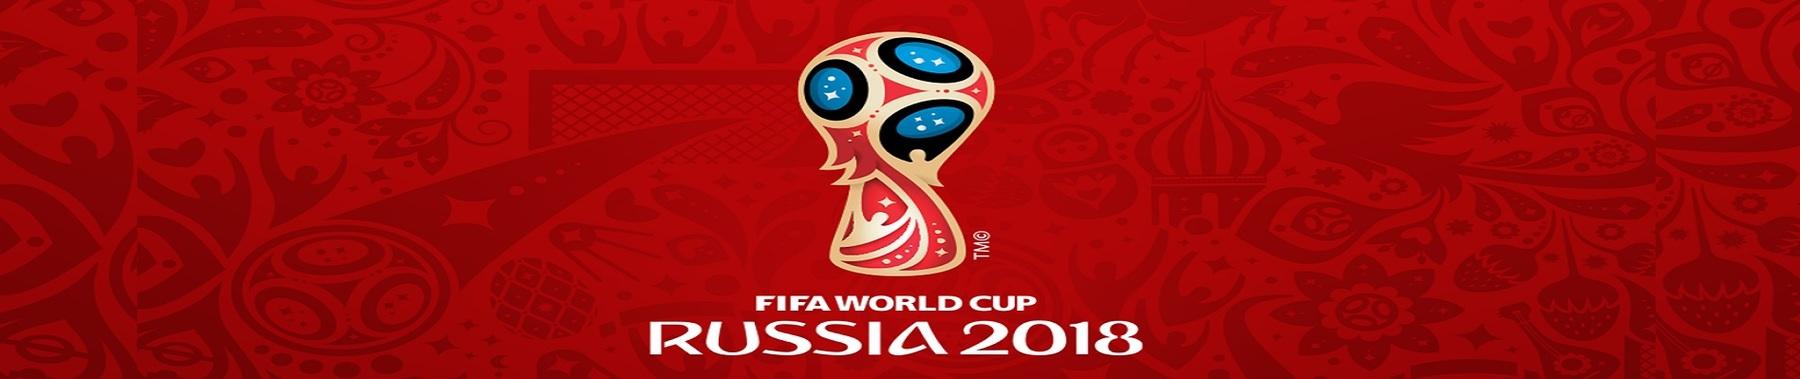 FIFA worldcup 2018 Dataset | Kaggle